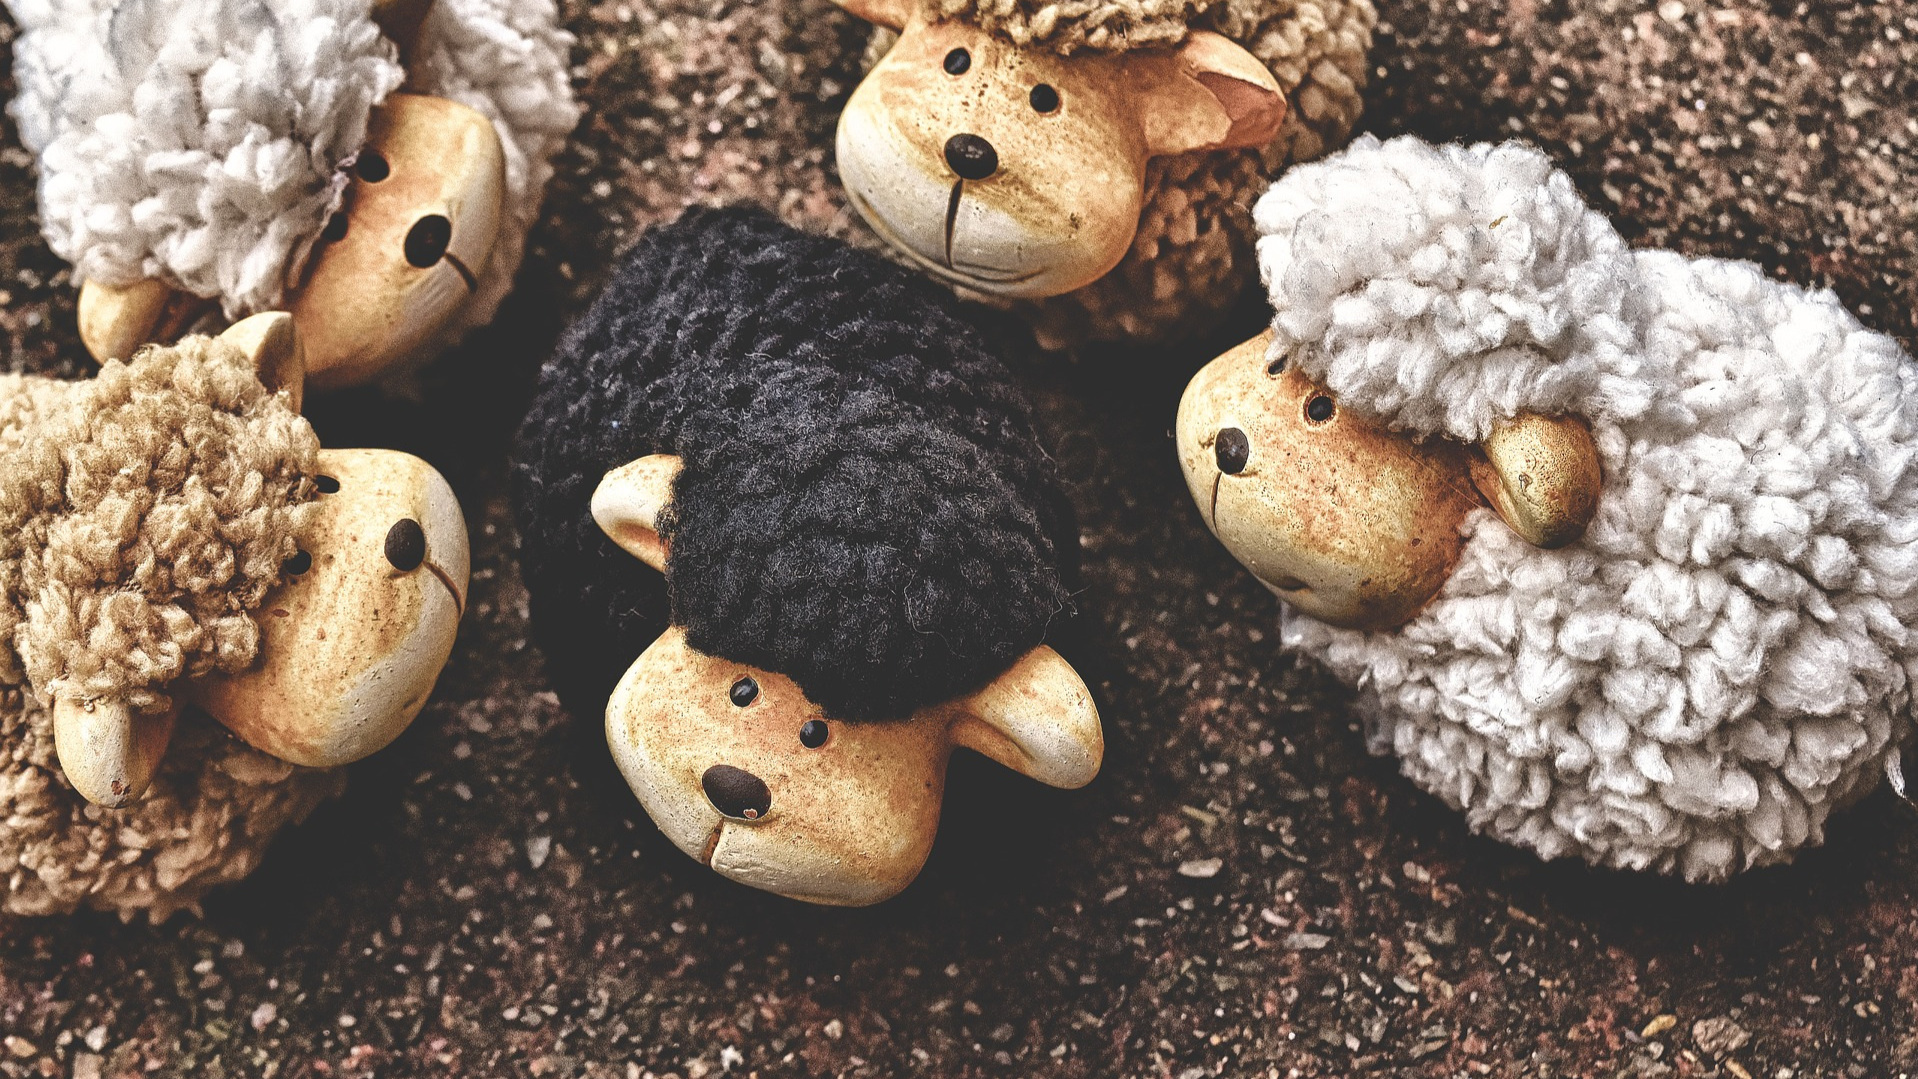 the-black-sheep-3702973_1920.jpg